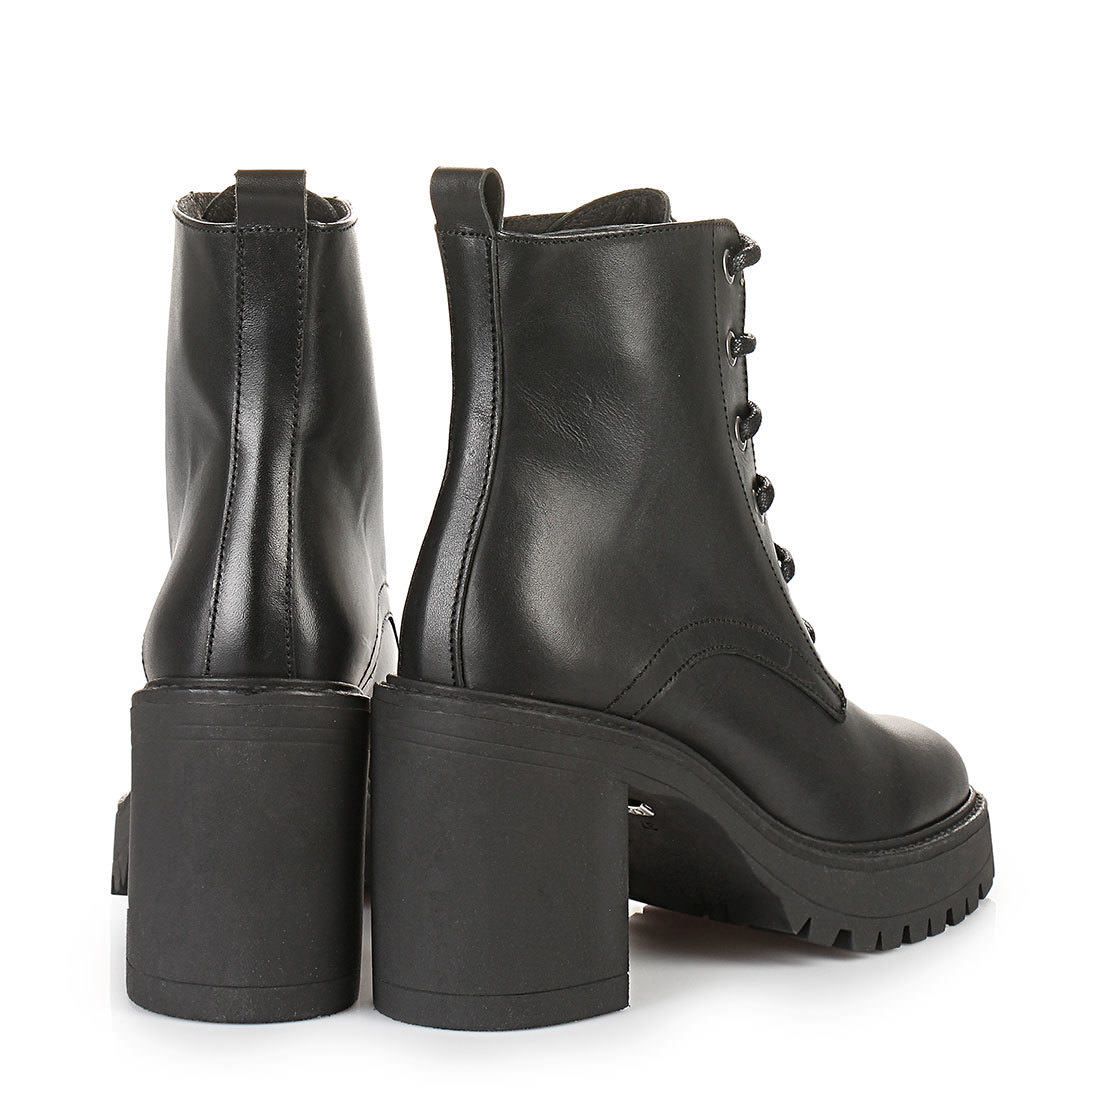 buffalo platform ankle boots in black buy online in buffalo online shop buffalo. Black Bedroom Furniture Sets. Home Design Ideas